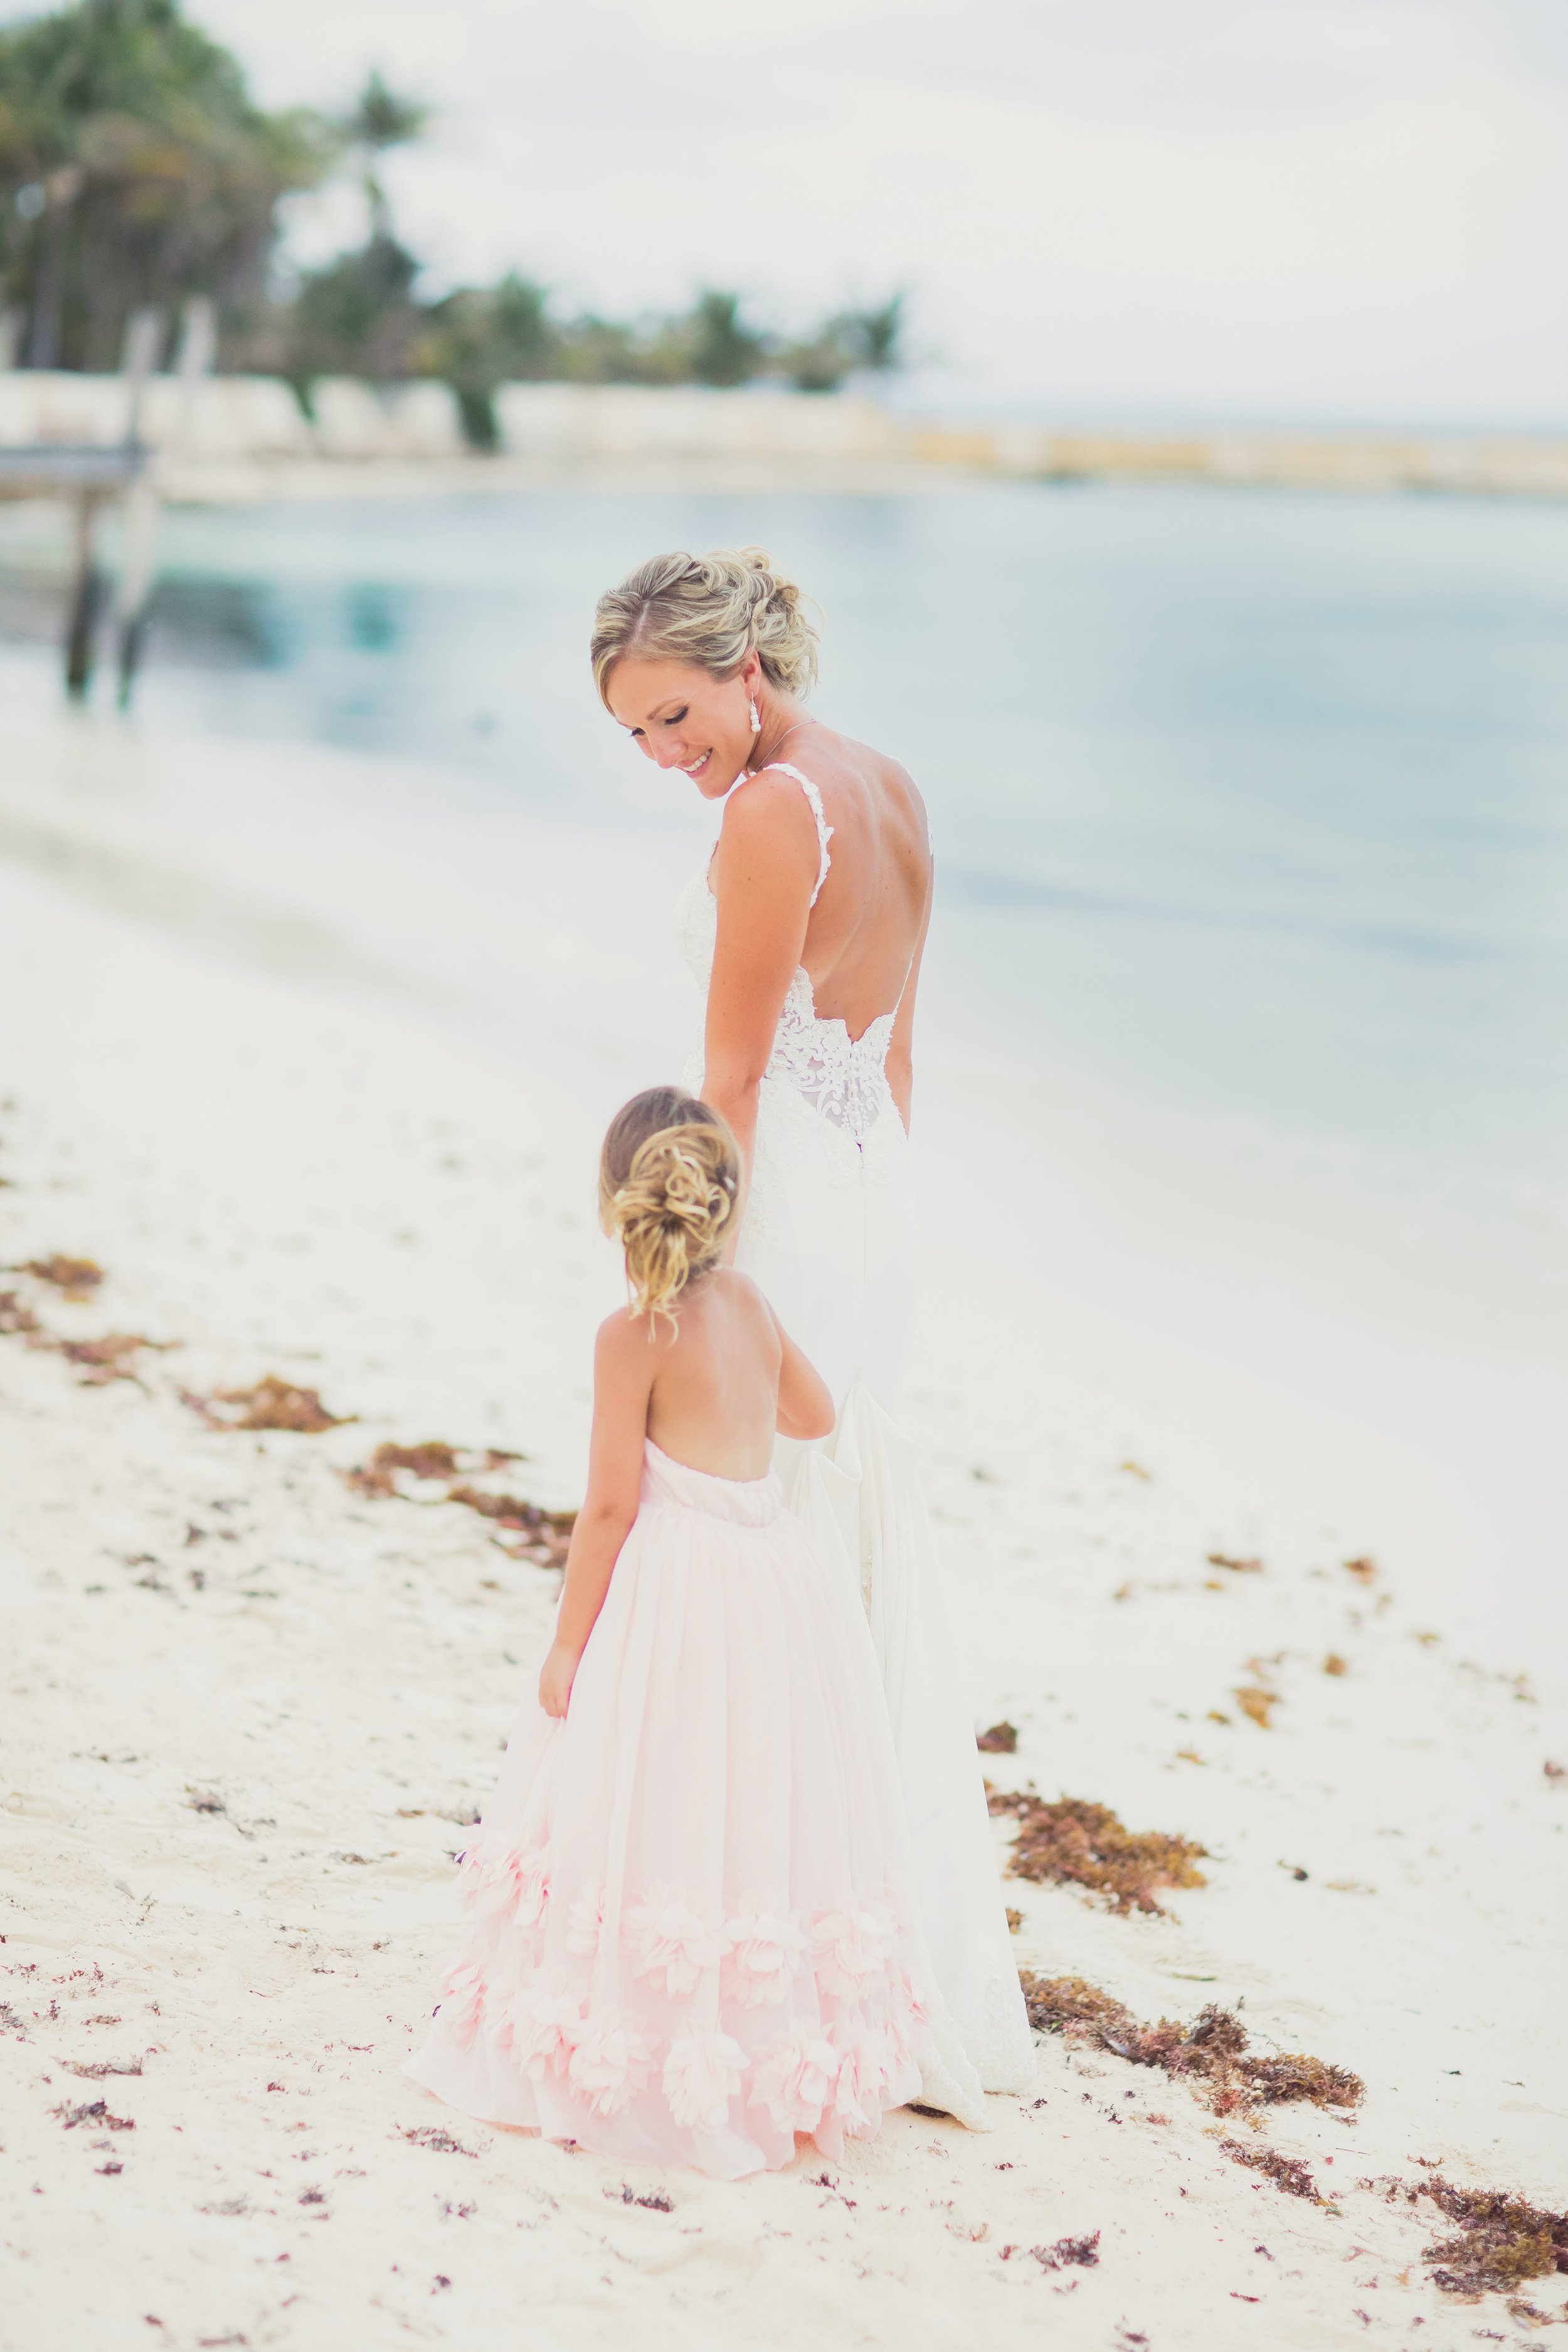 cancun-wedding-venue-villa-la-joya-960 copy-websize.jpg